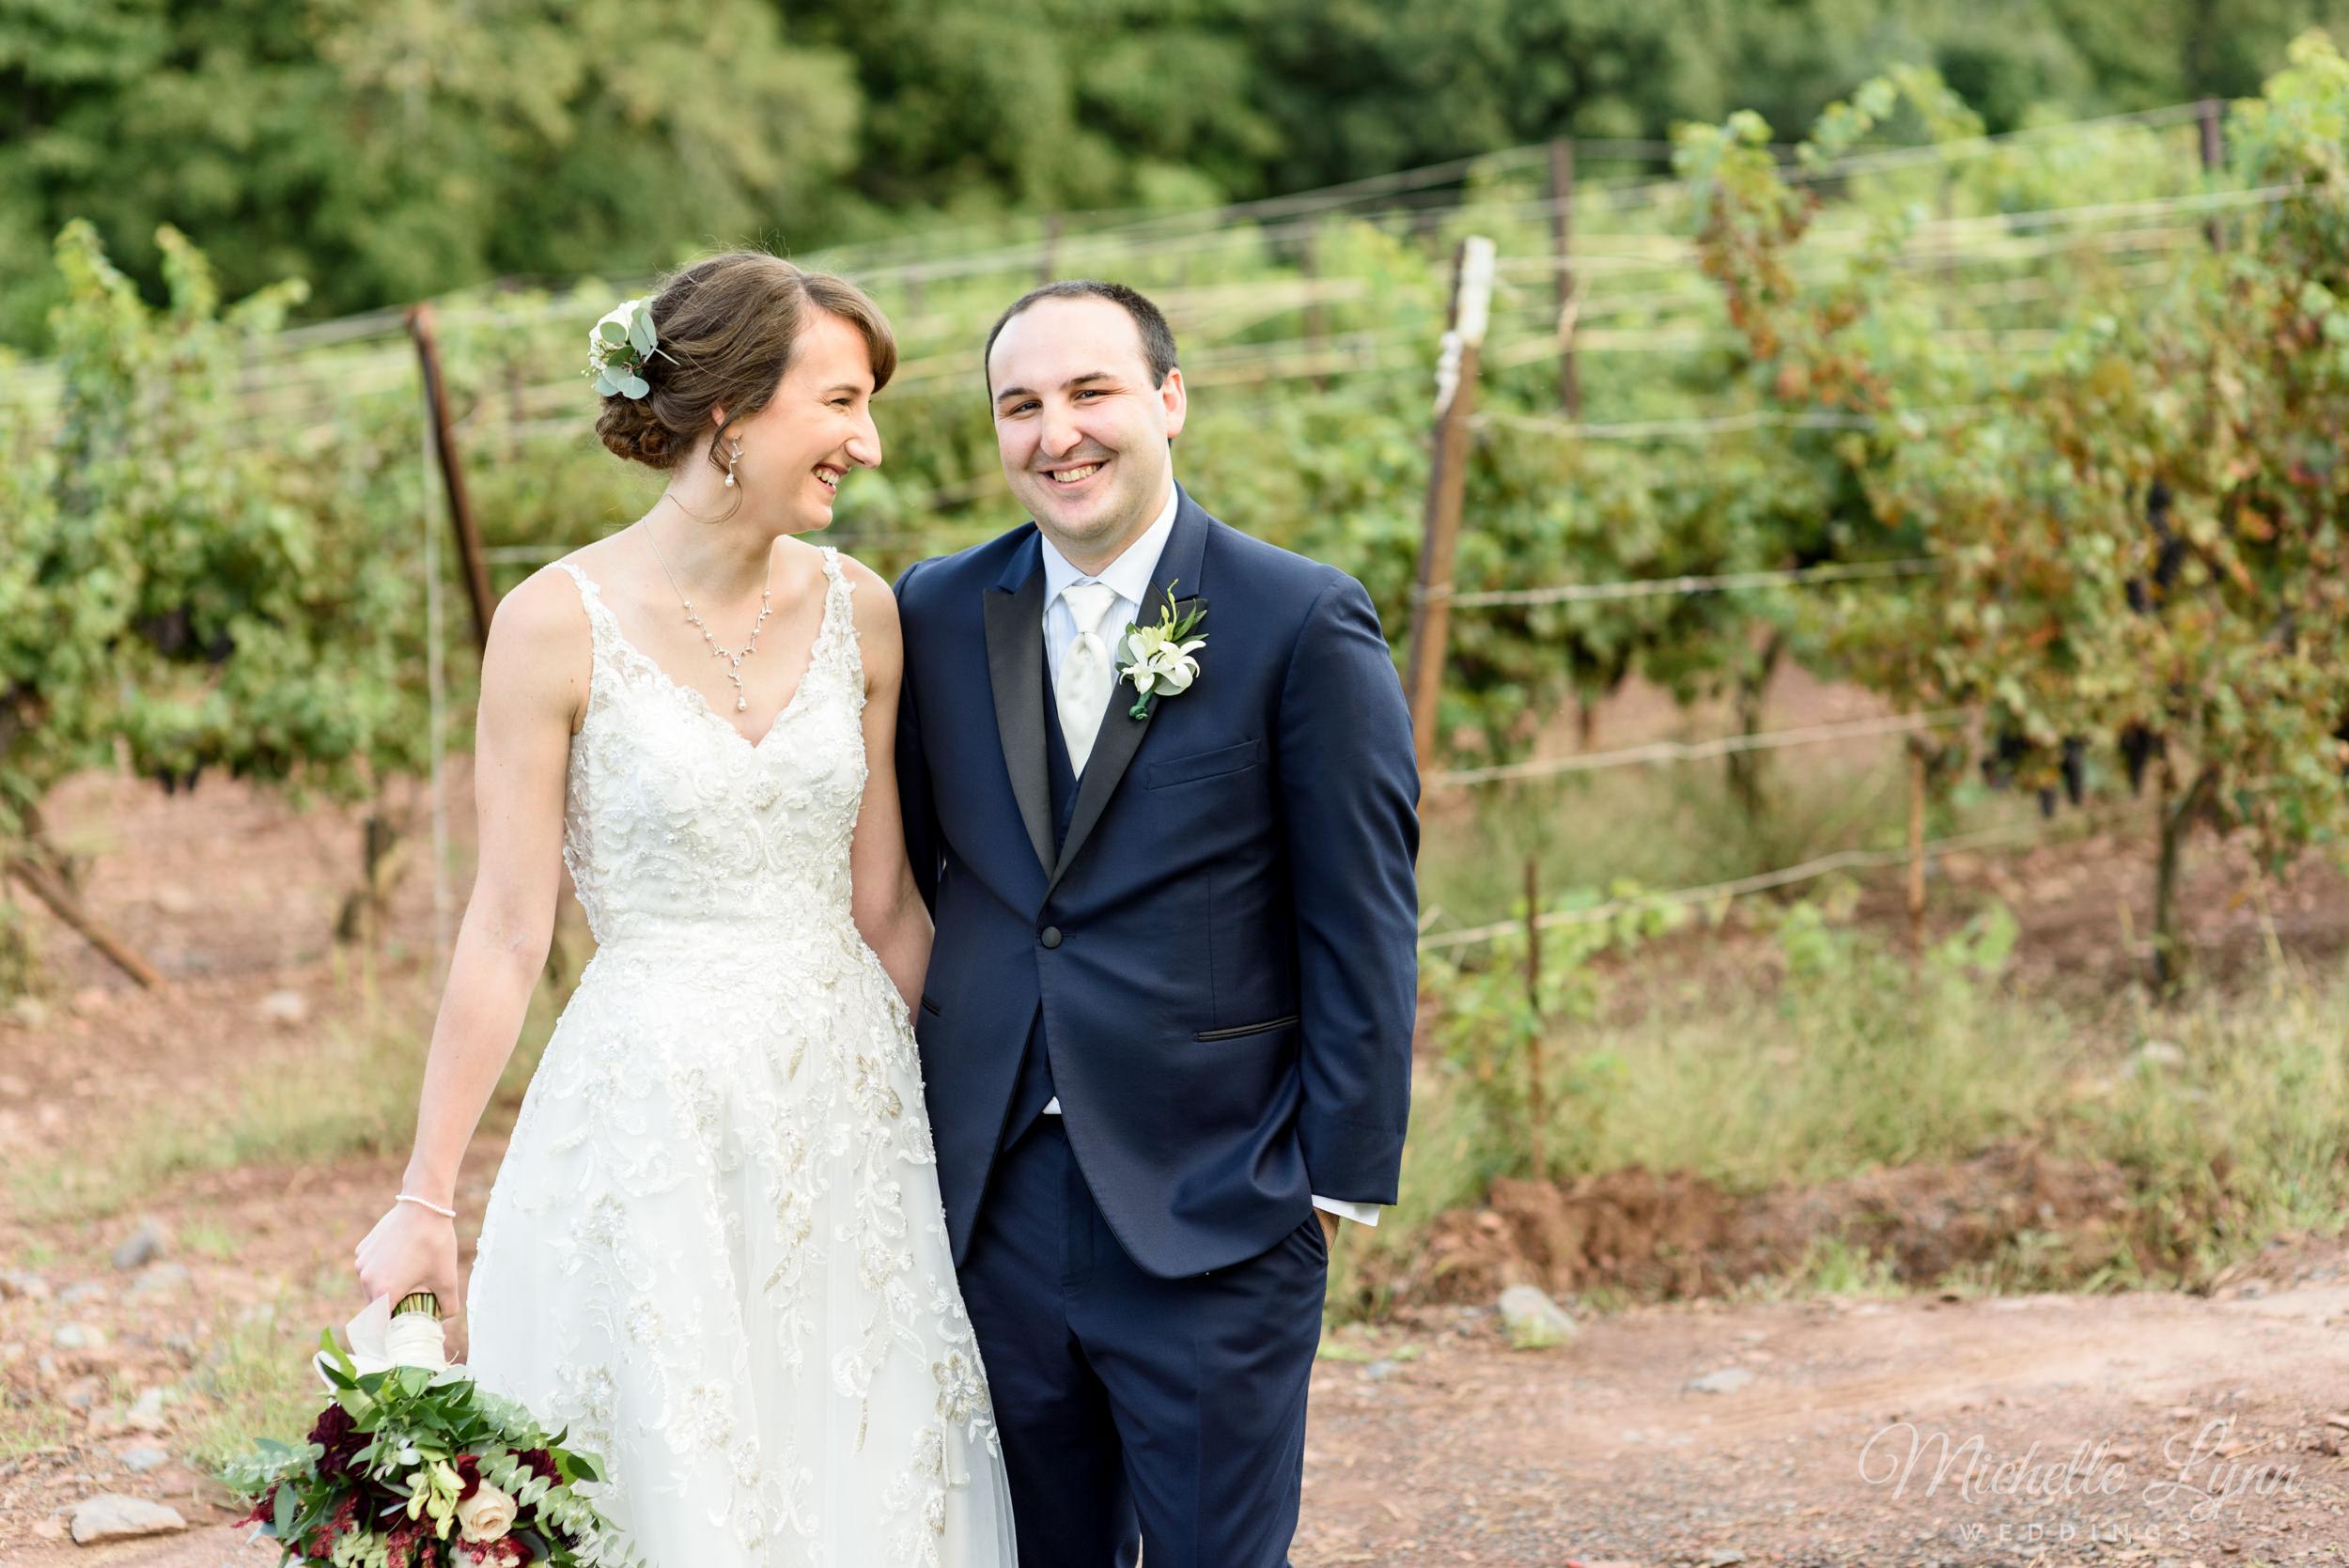 sand-castle-winery-pennsylvania-wedding-photography-59.jpg